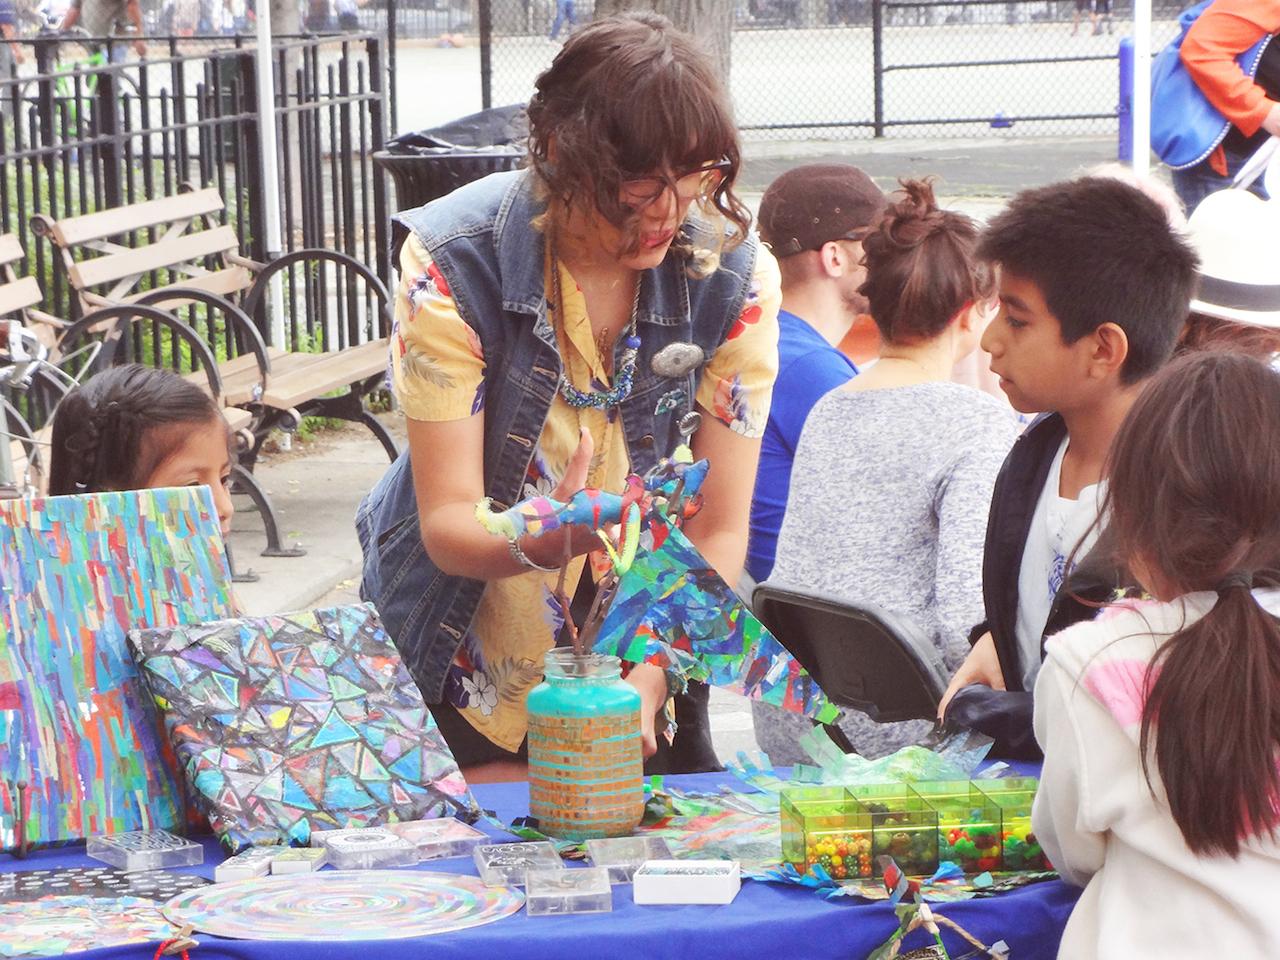 Bushwick Open Studios 2014 Community Day in Maria Hernandez Park (photo by Peter Hamernick, courtesy Arts in Bushwick)